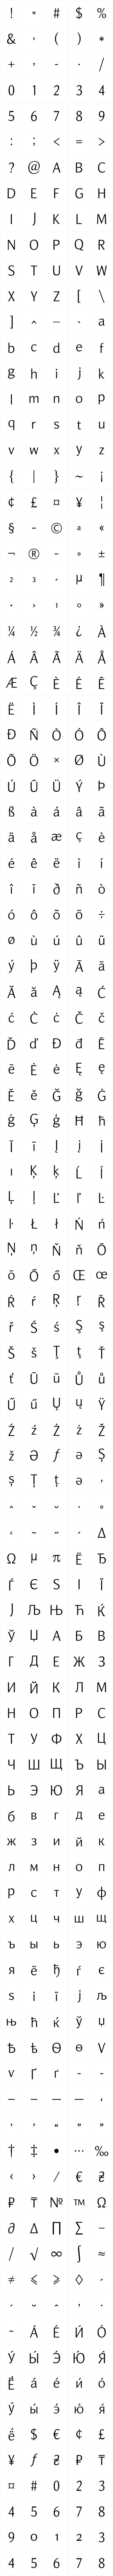 Orbi Sans